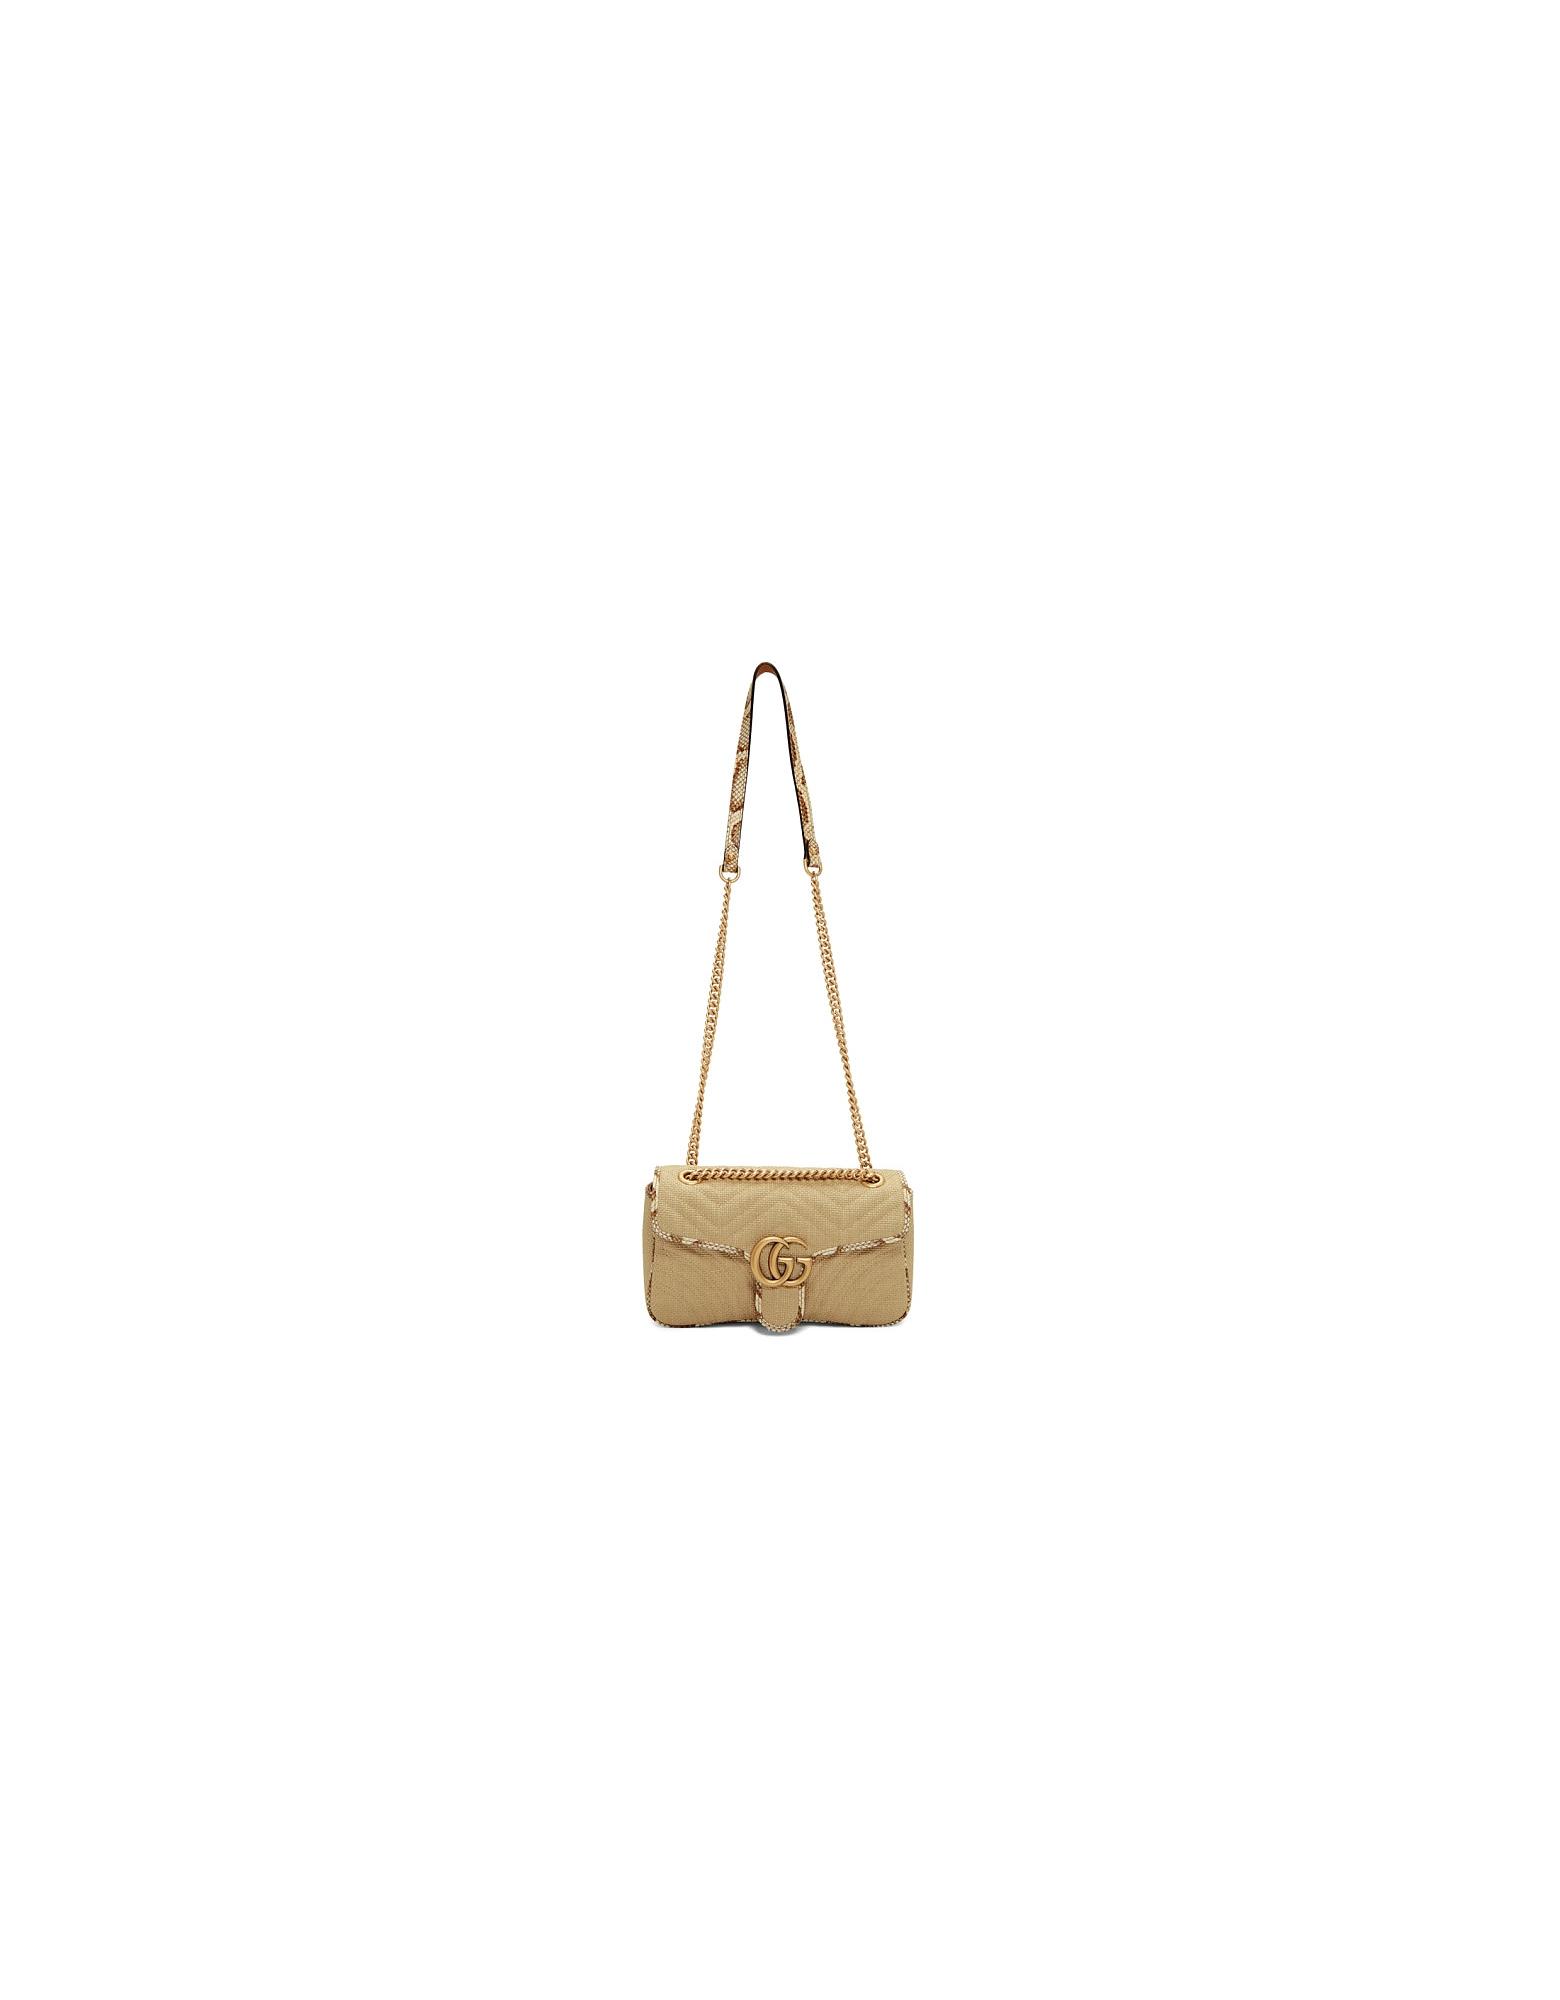 Gucci Designer Handbags, Beige Raffia GG Marmont Bag